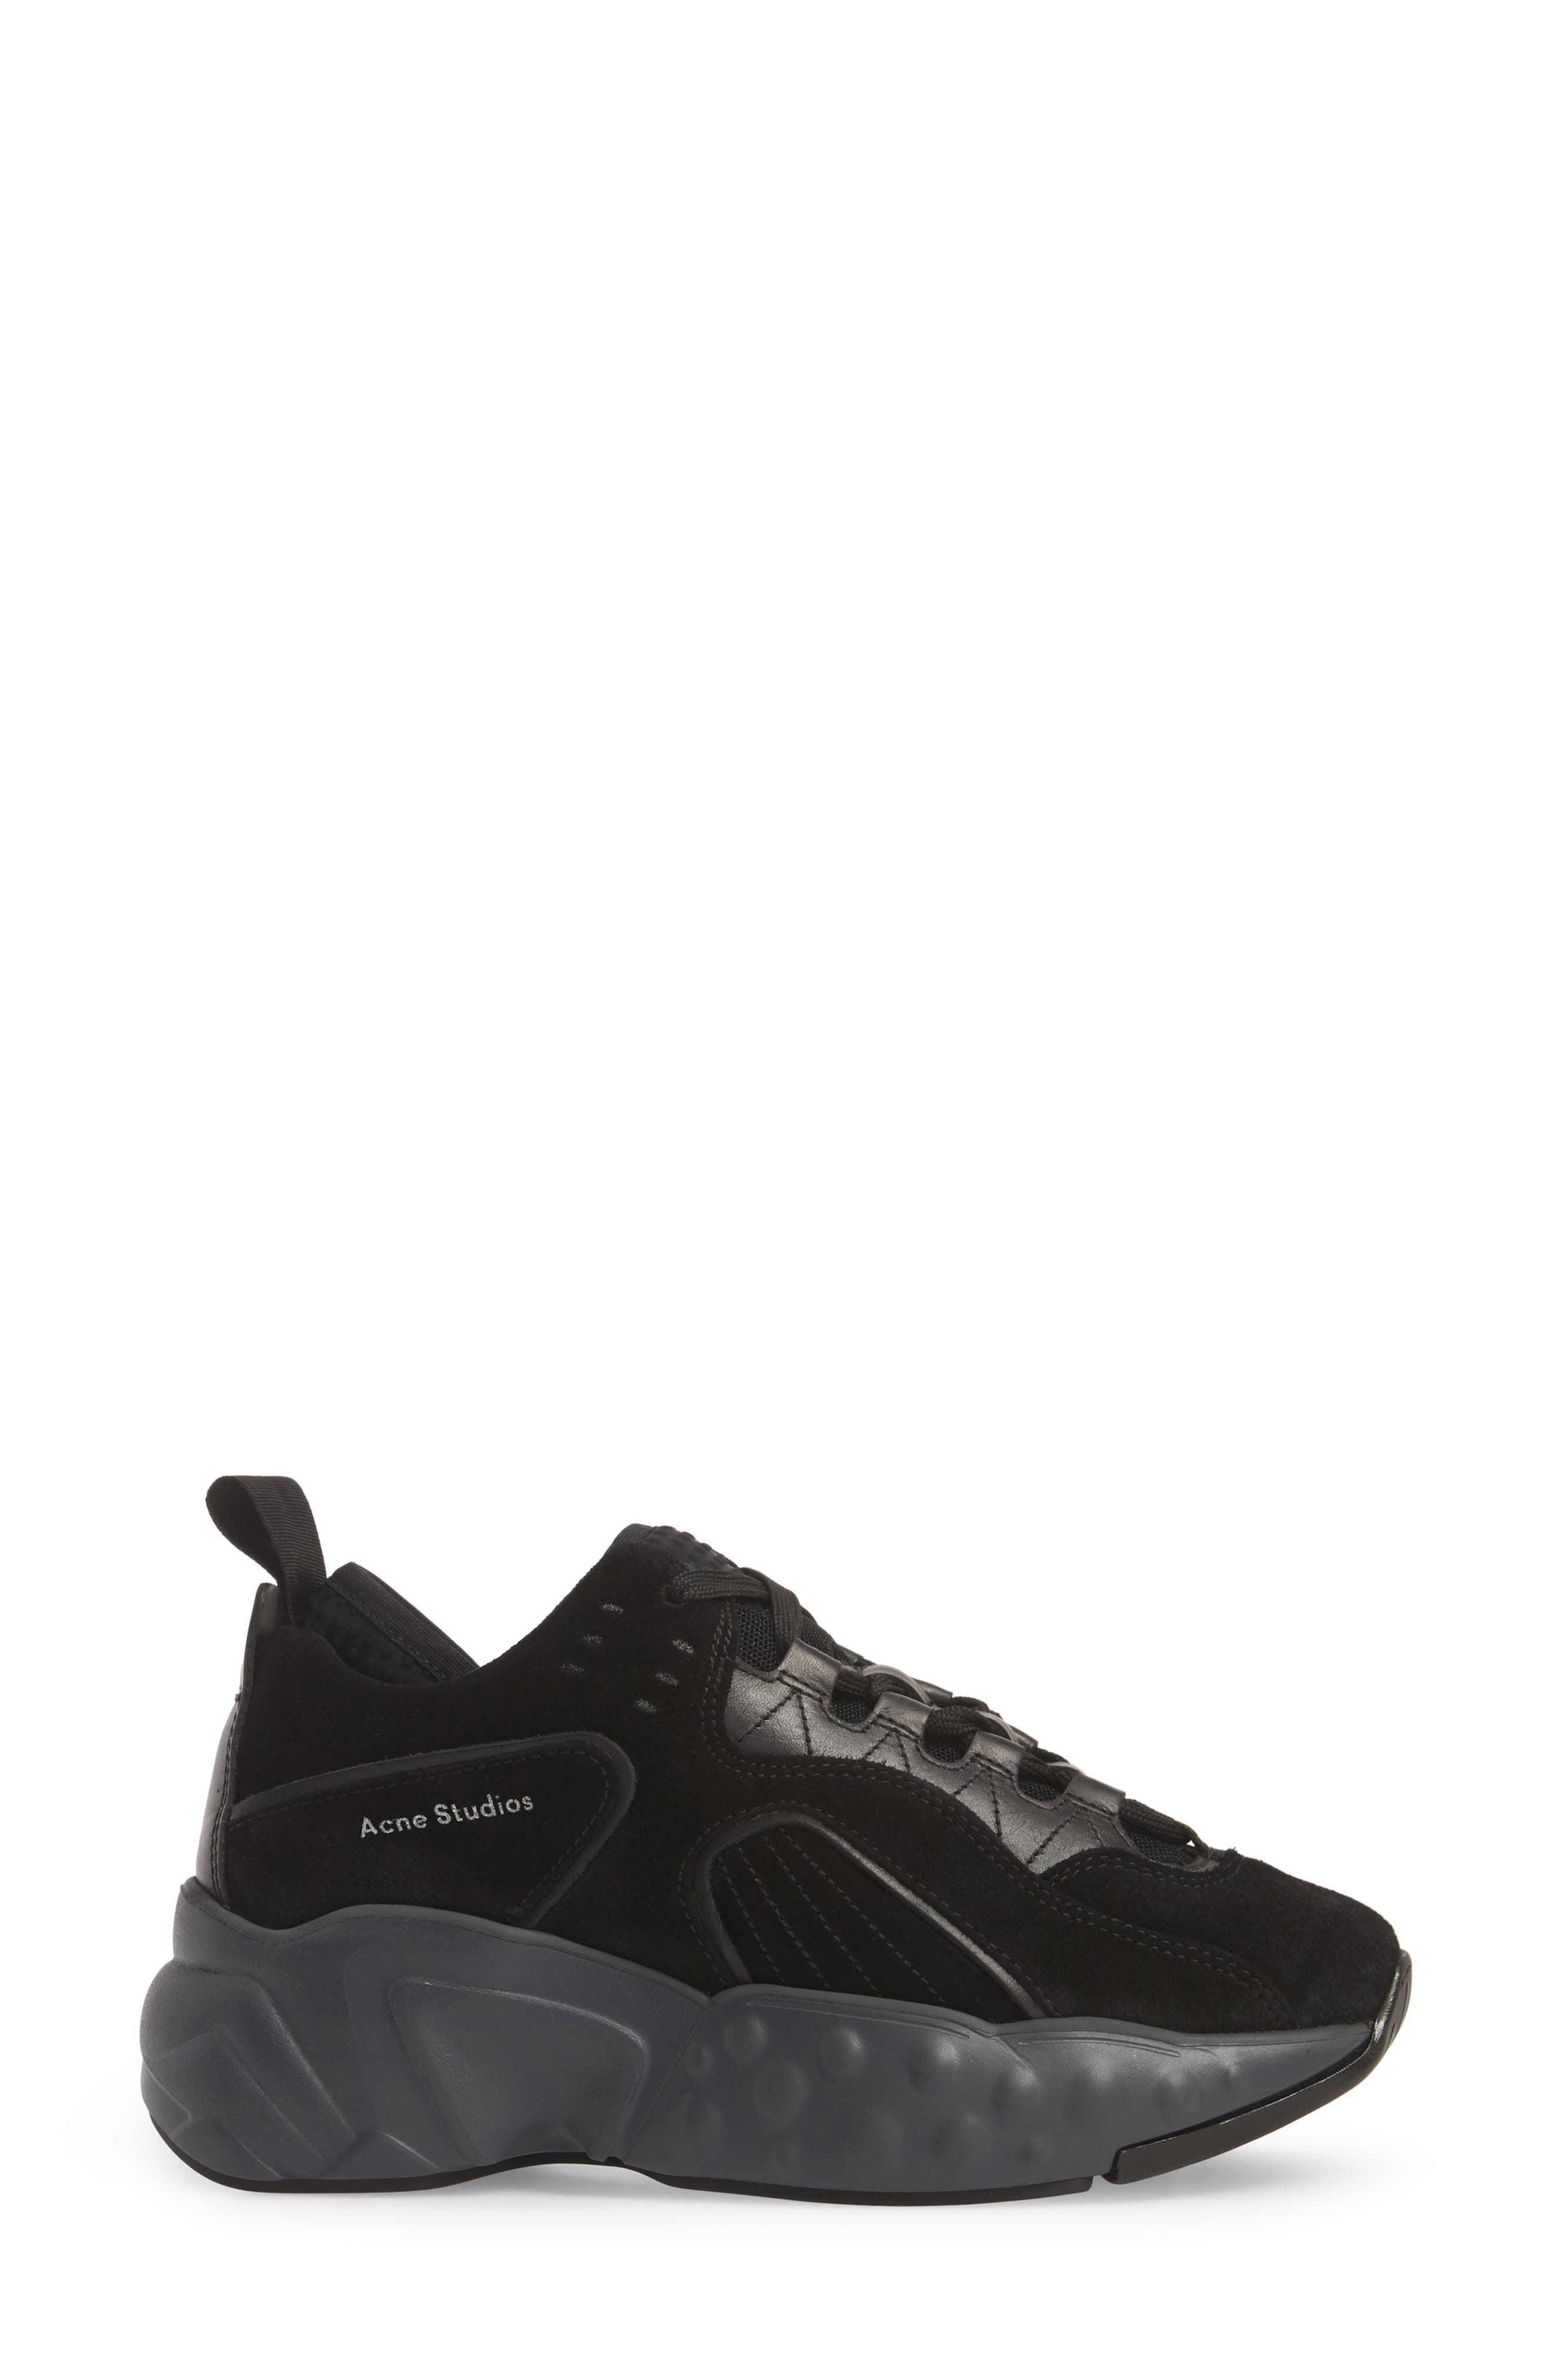 ACNE STUDIOS, Manhattan Sneaker, Alternate thumbnail 3, color, MULTI BLACK